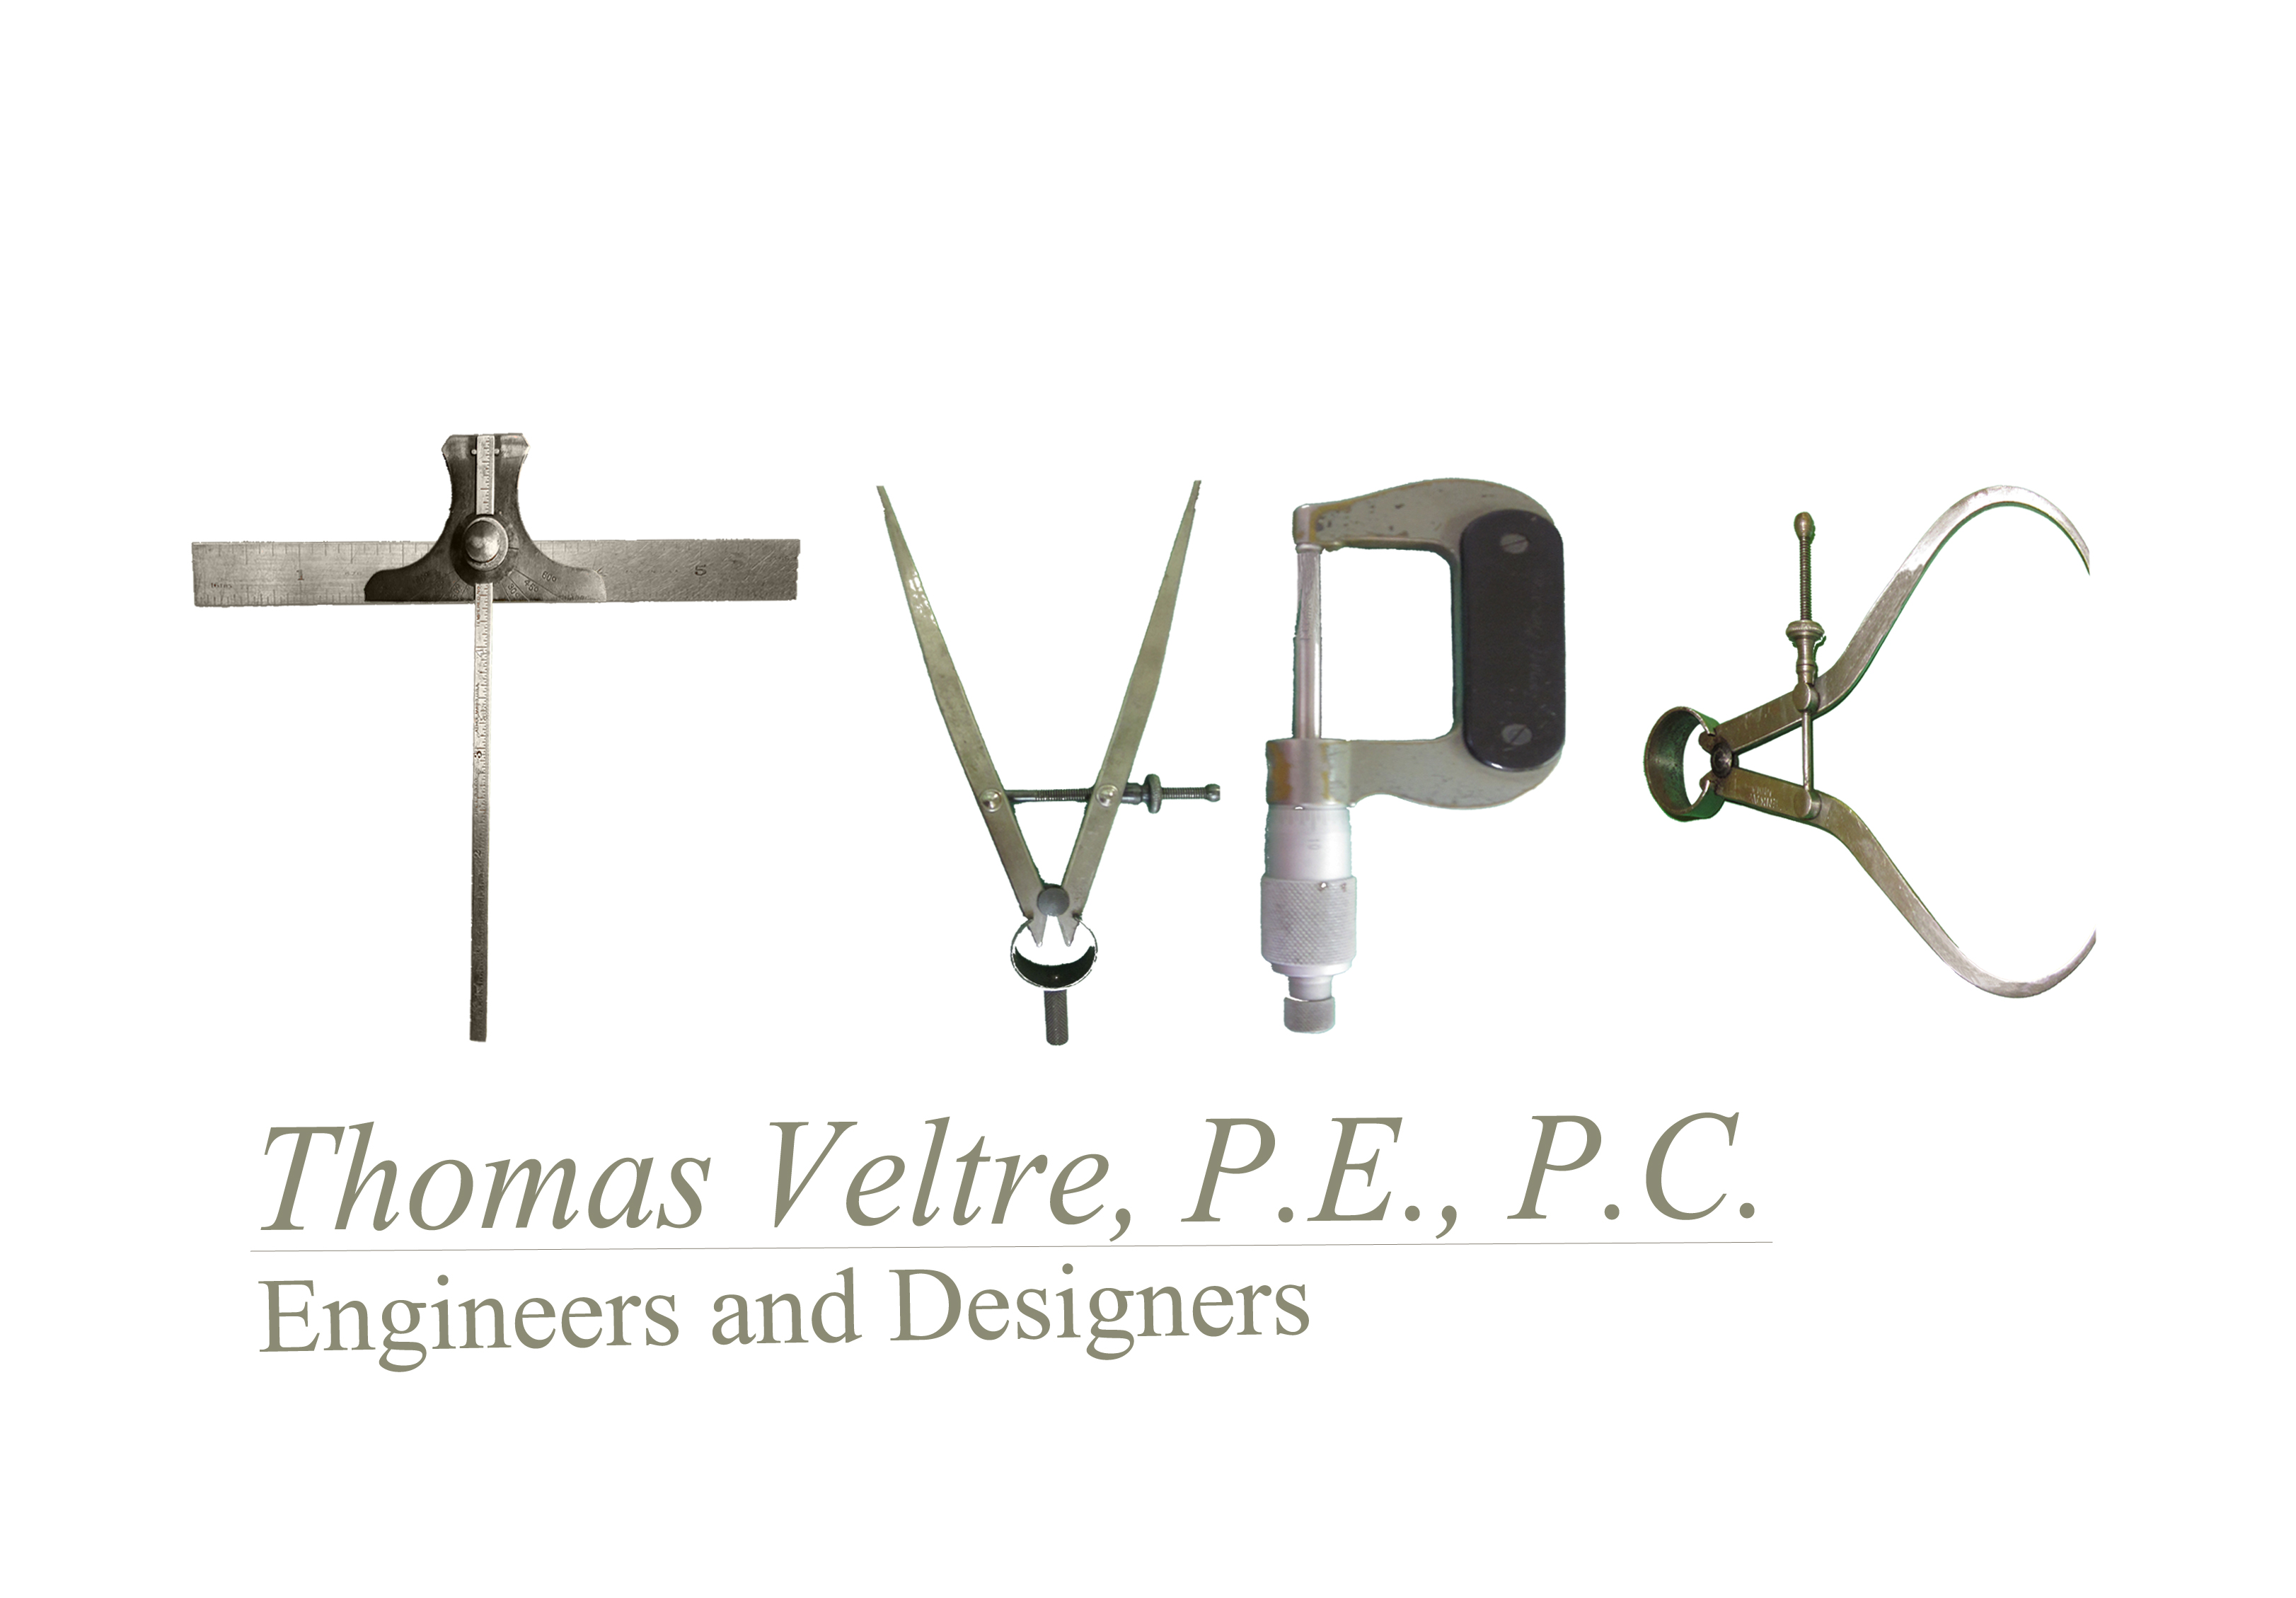 Thomas Veltre, P.E, P.C